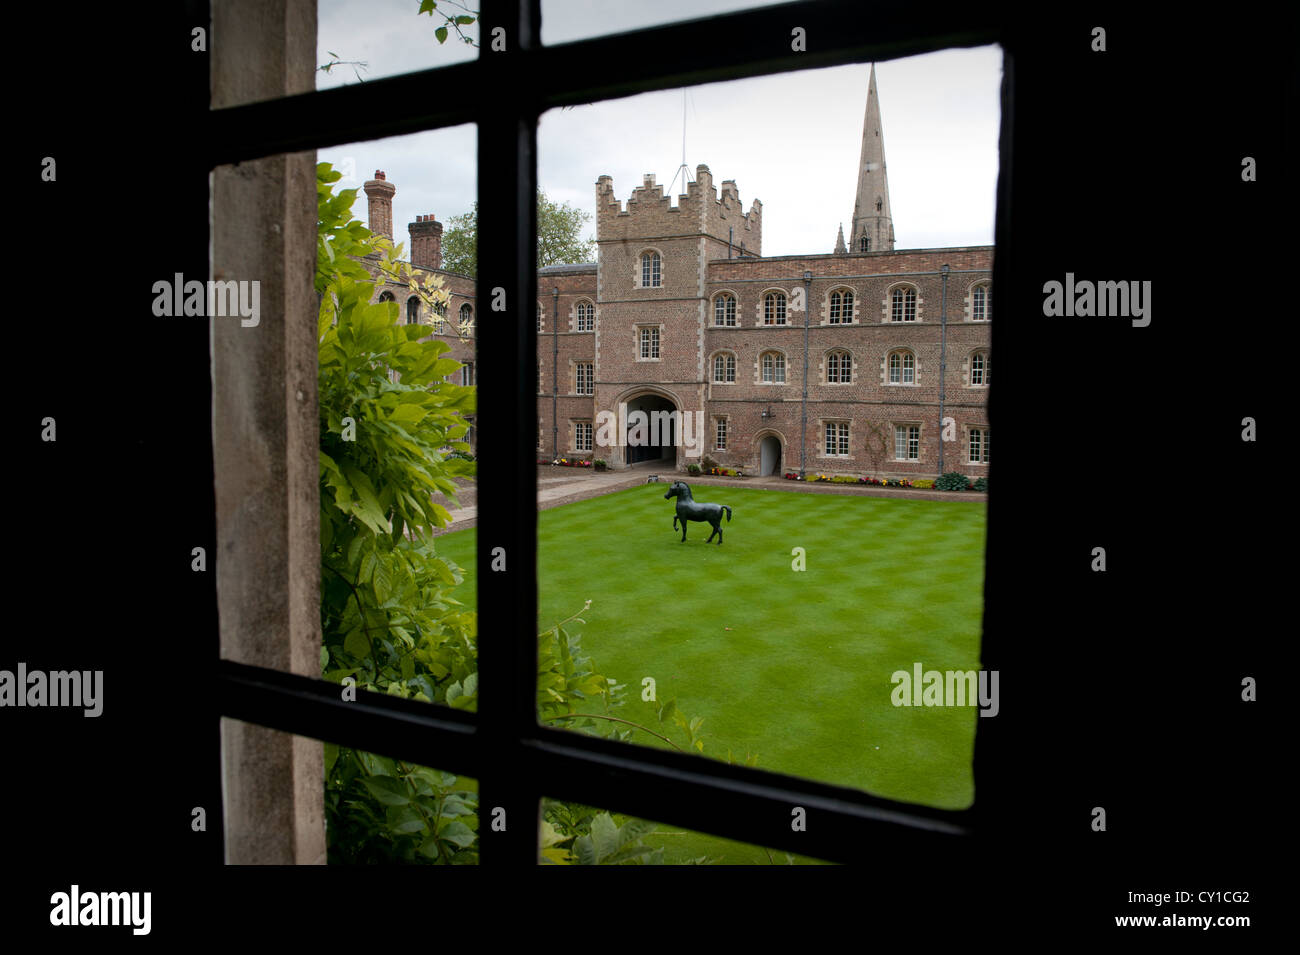 Jesus College in the University City of Cambridge, England. 8-2012 - Stock Image